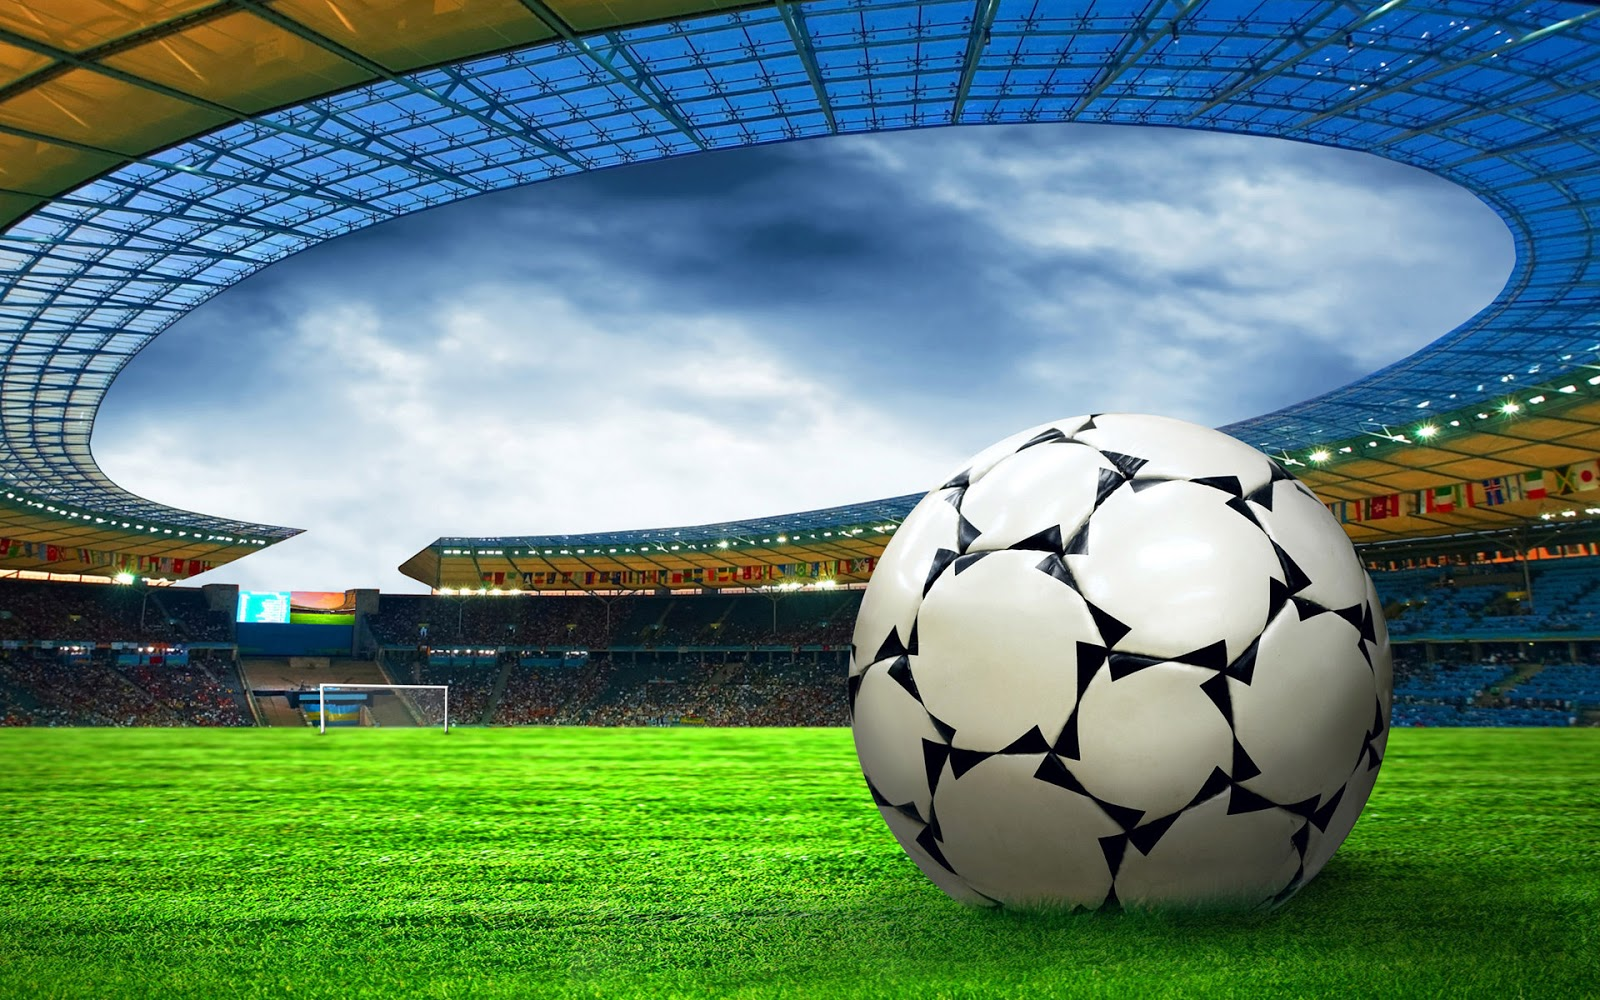 Wallpaper De Un Balon De Futbol Que Esta En Un Estadio